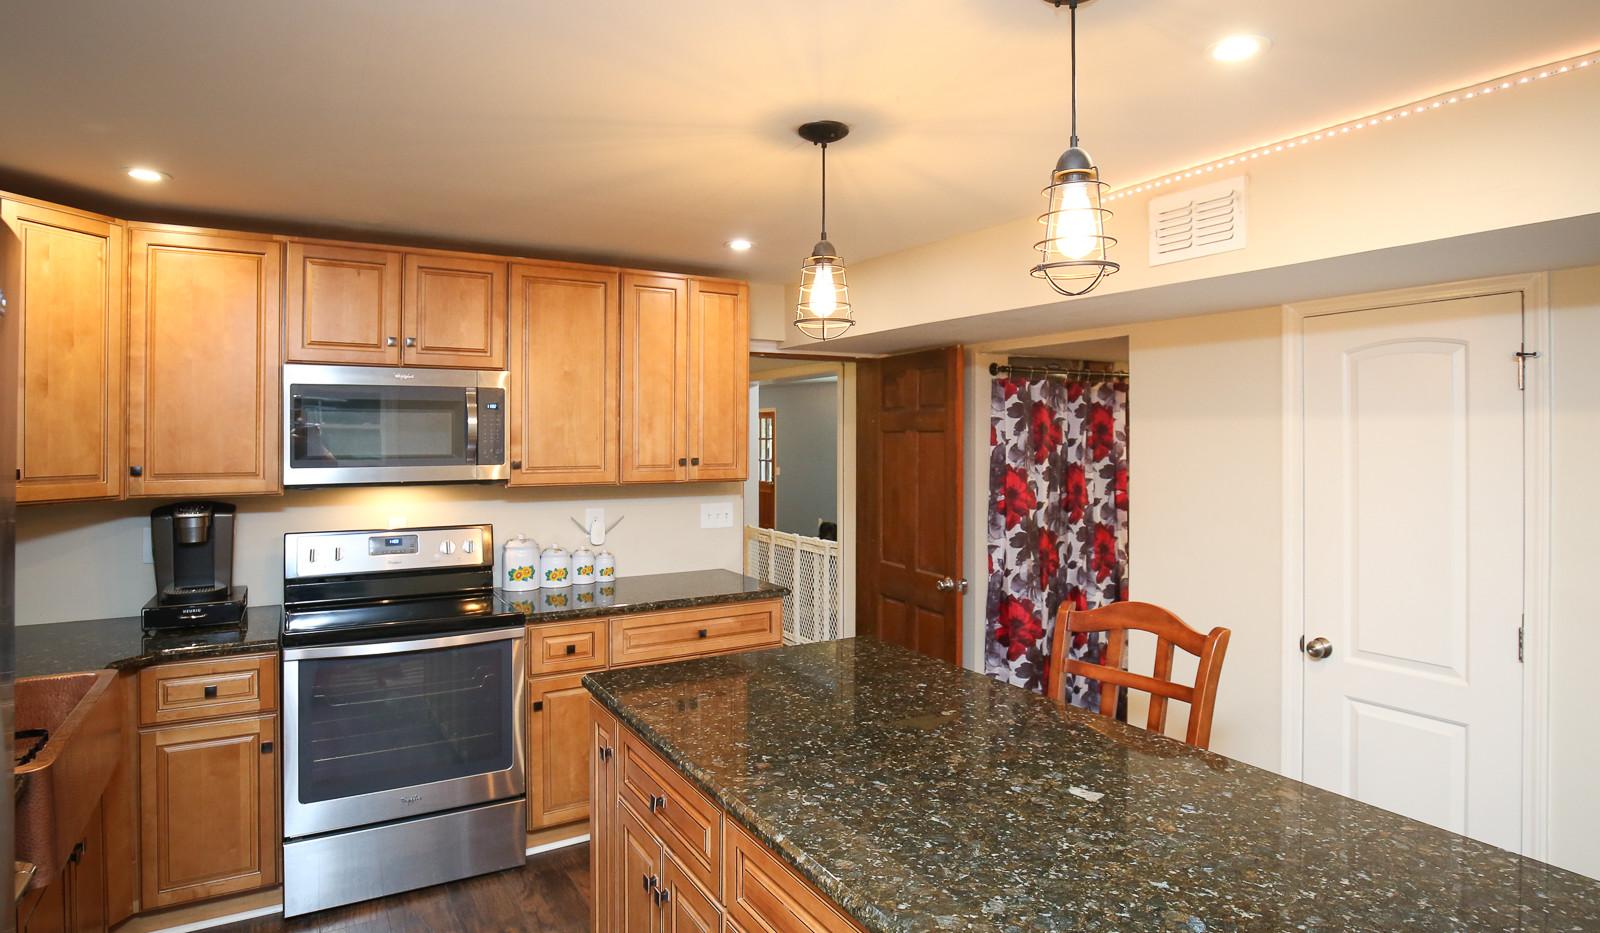 042_294_barnes_ave_kitchen.jpg